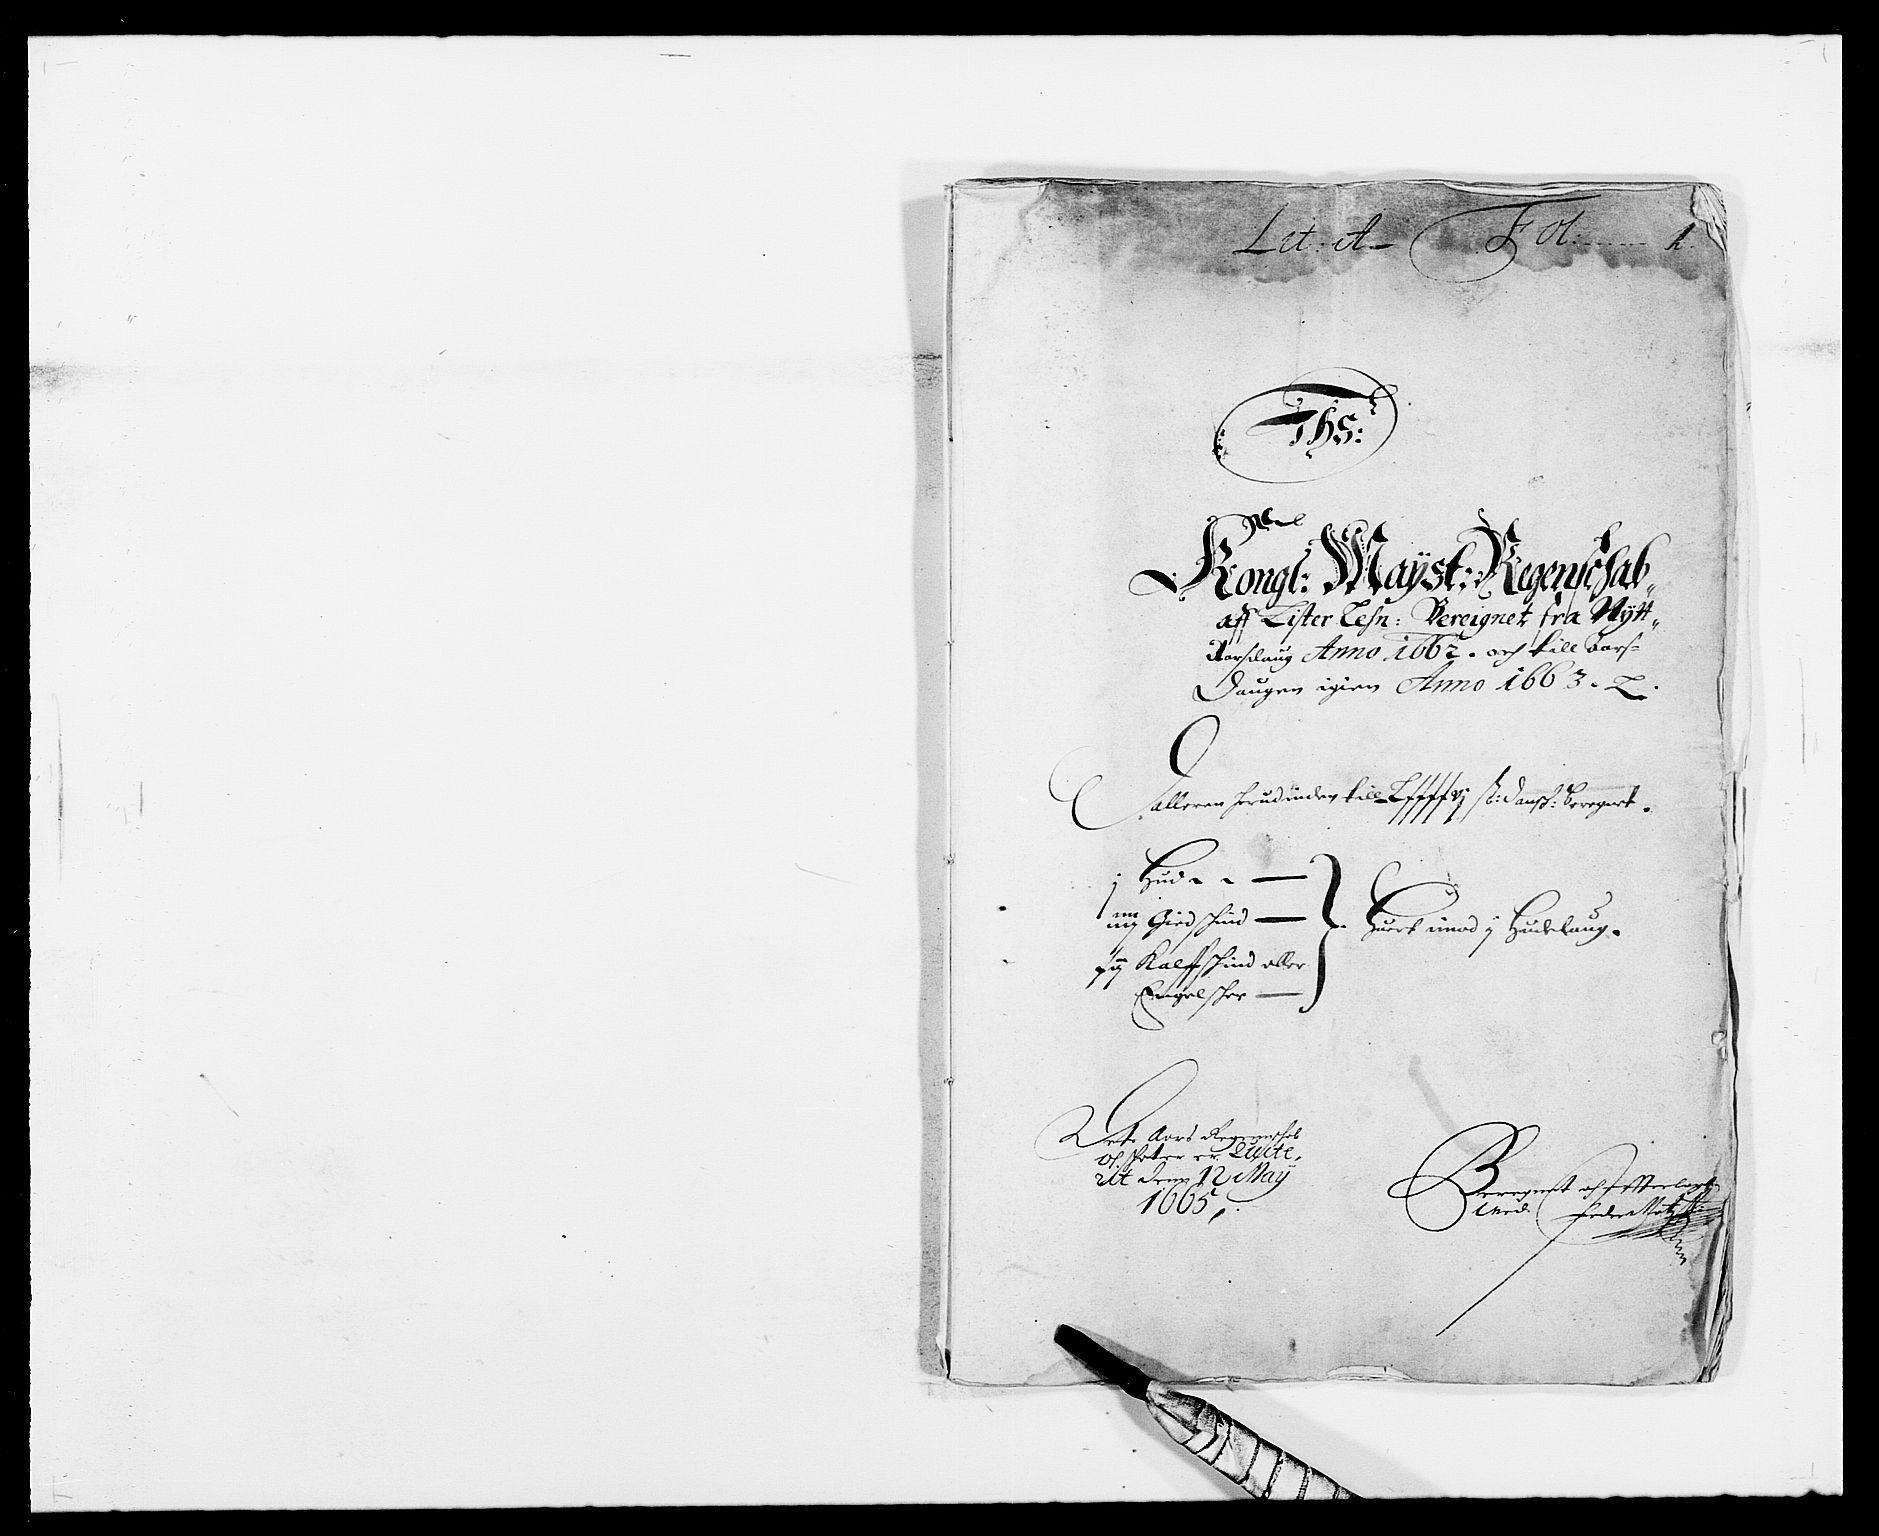 RA, Rentekammeret inntil 1814, Reviderte regnskaper, Fogderegnskap, R41/L2522: Fogderegnskap Lista, 1662, s. 1